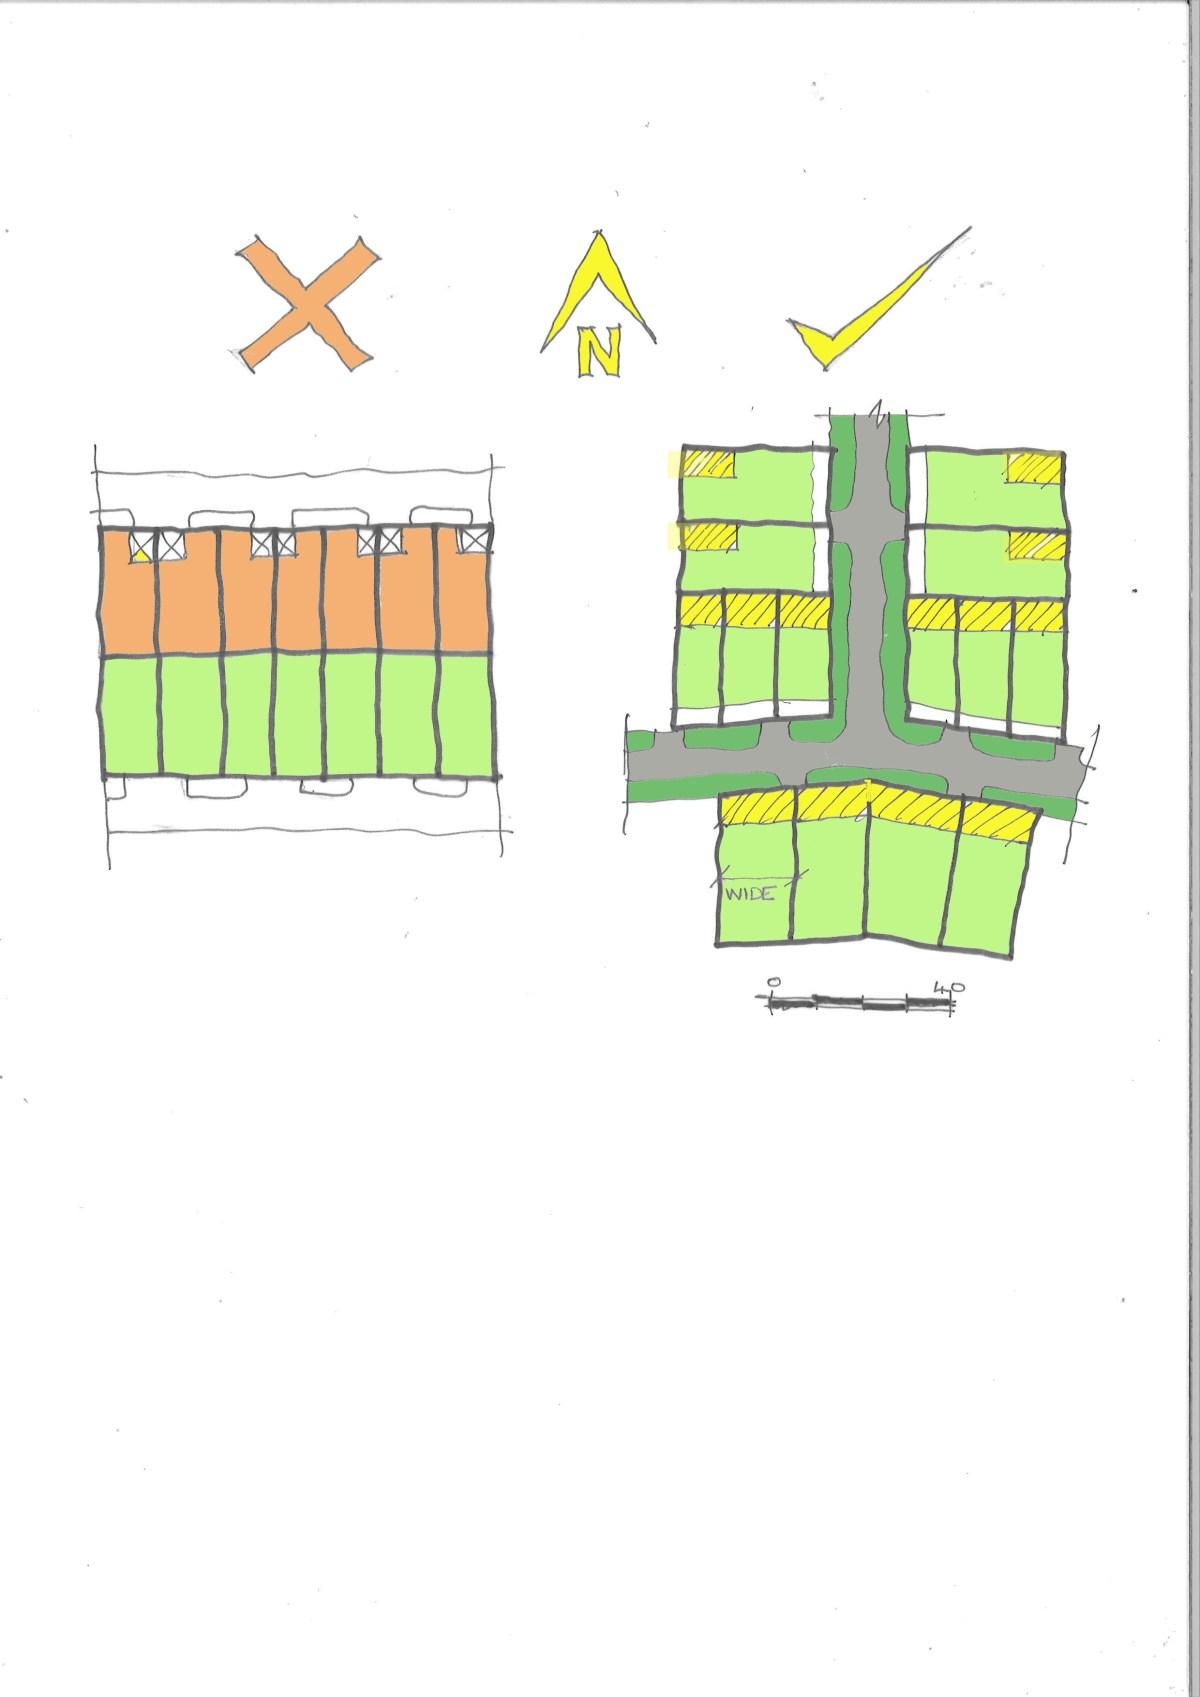 Good and bad block orientation